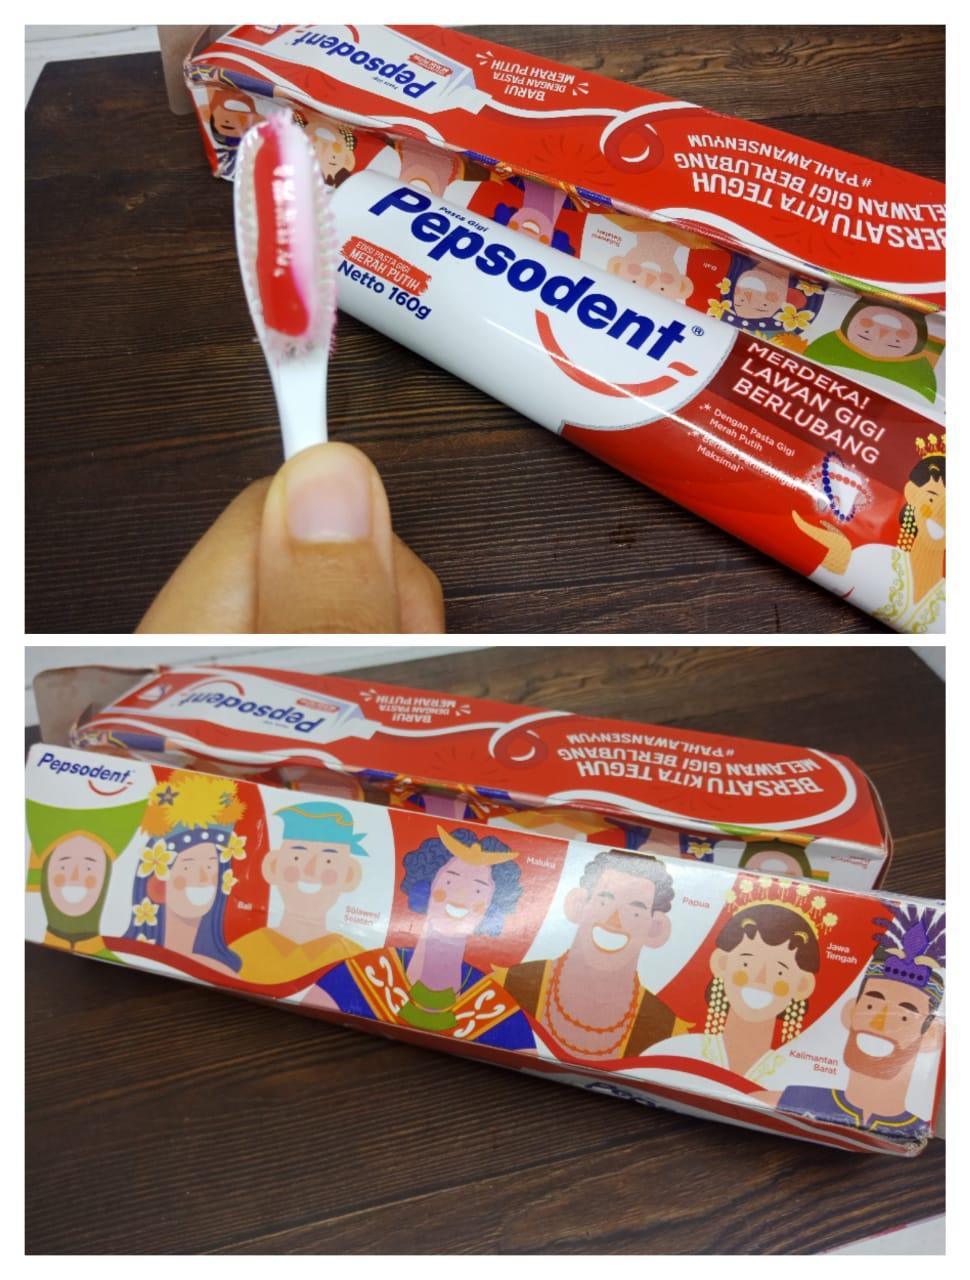 pepsodent merdekakan senyum indonesia, pepsodent edisi merah putih